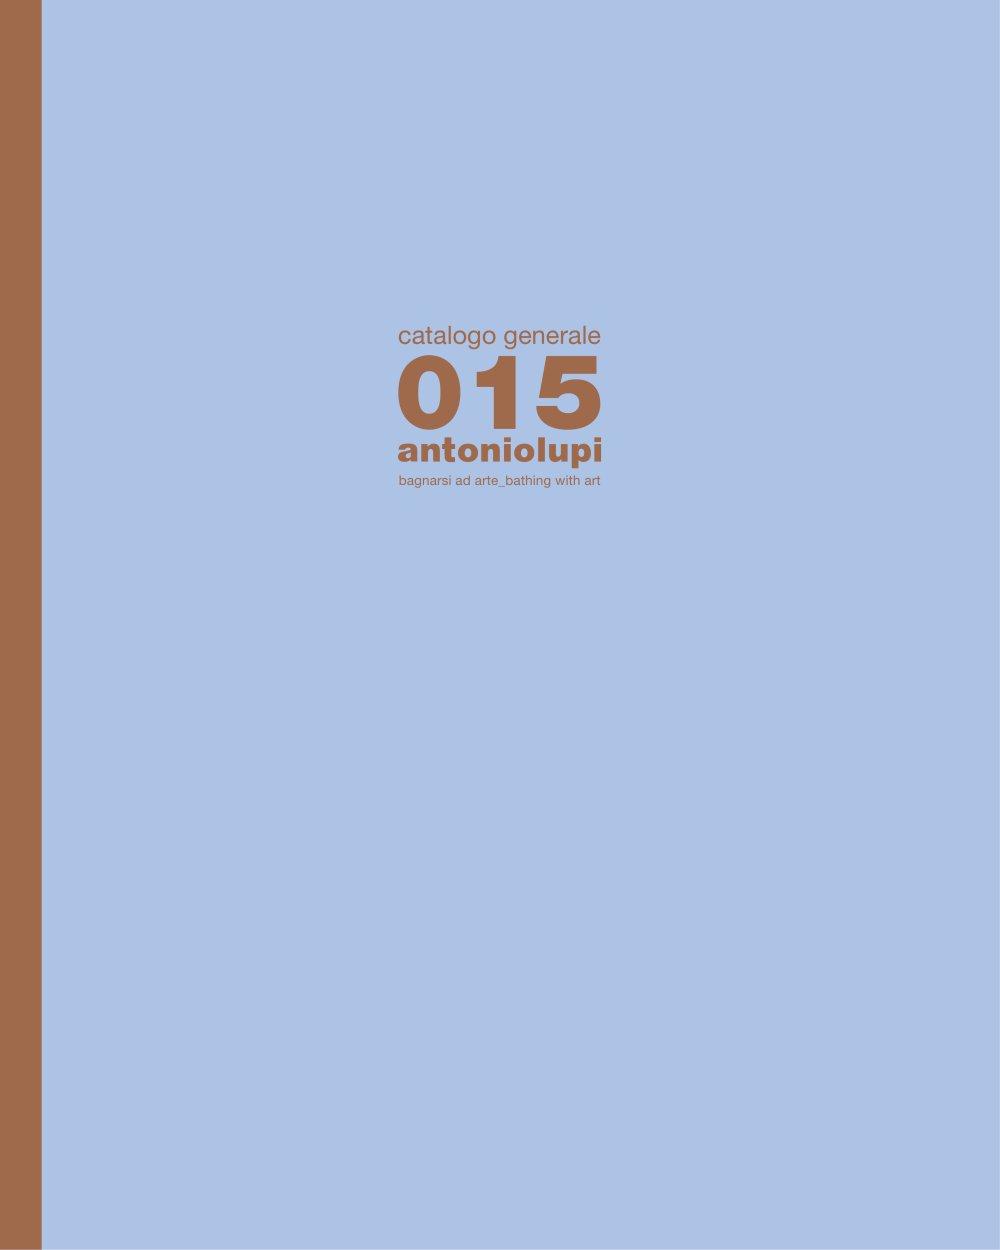 general catalogue 2015 - ANTONIO LUPI - PDF Catalogues ...